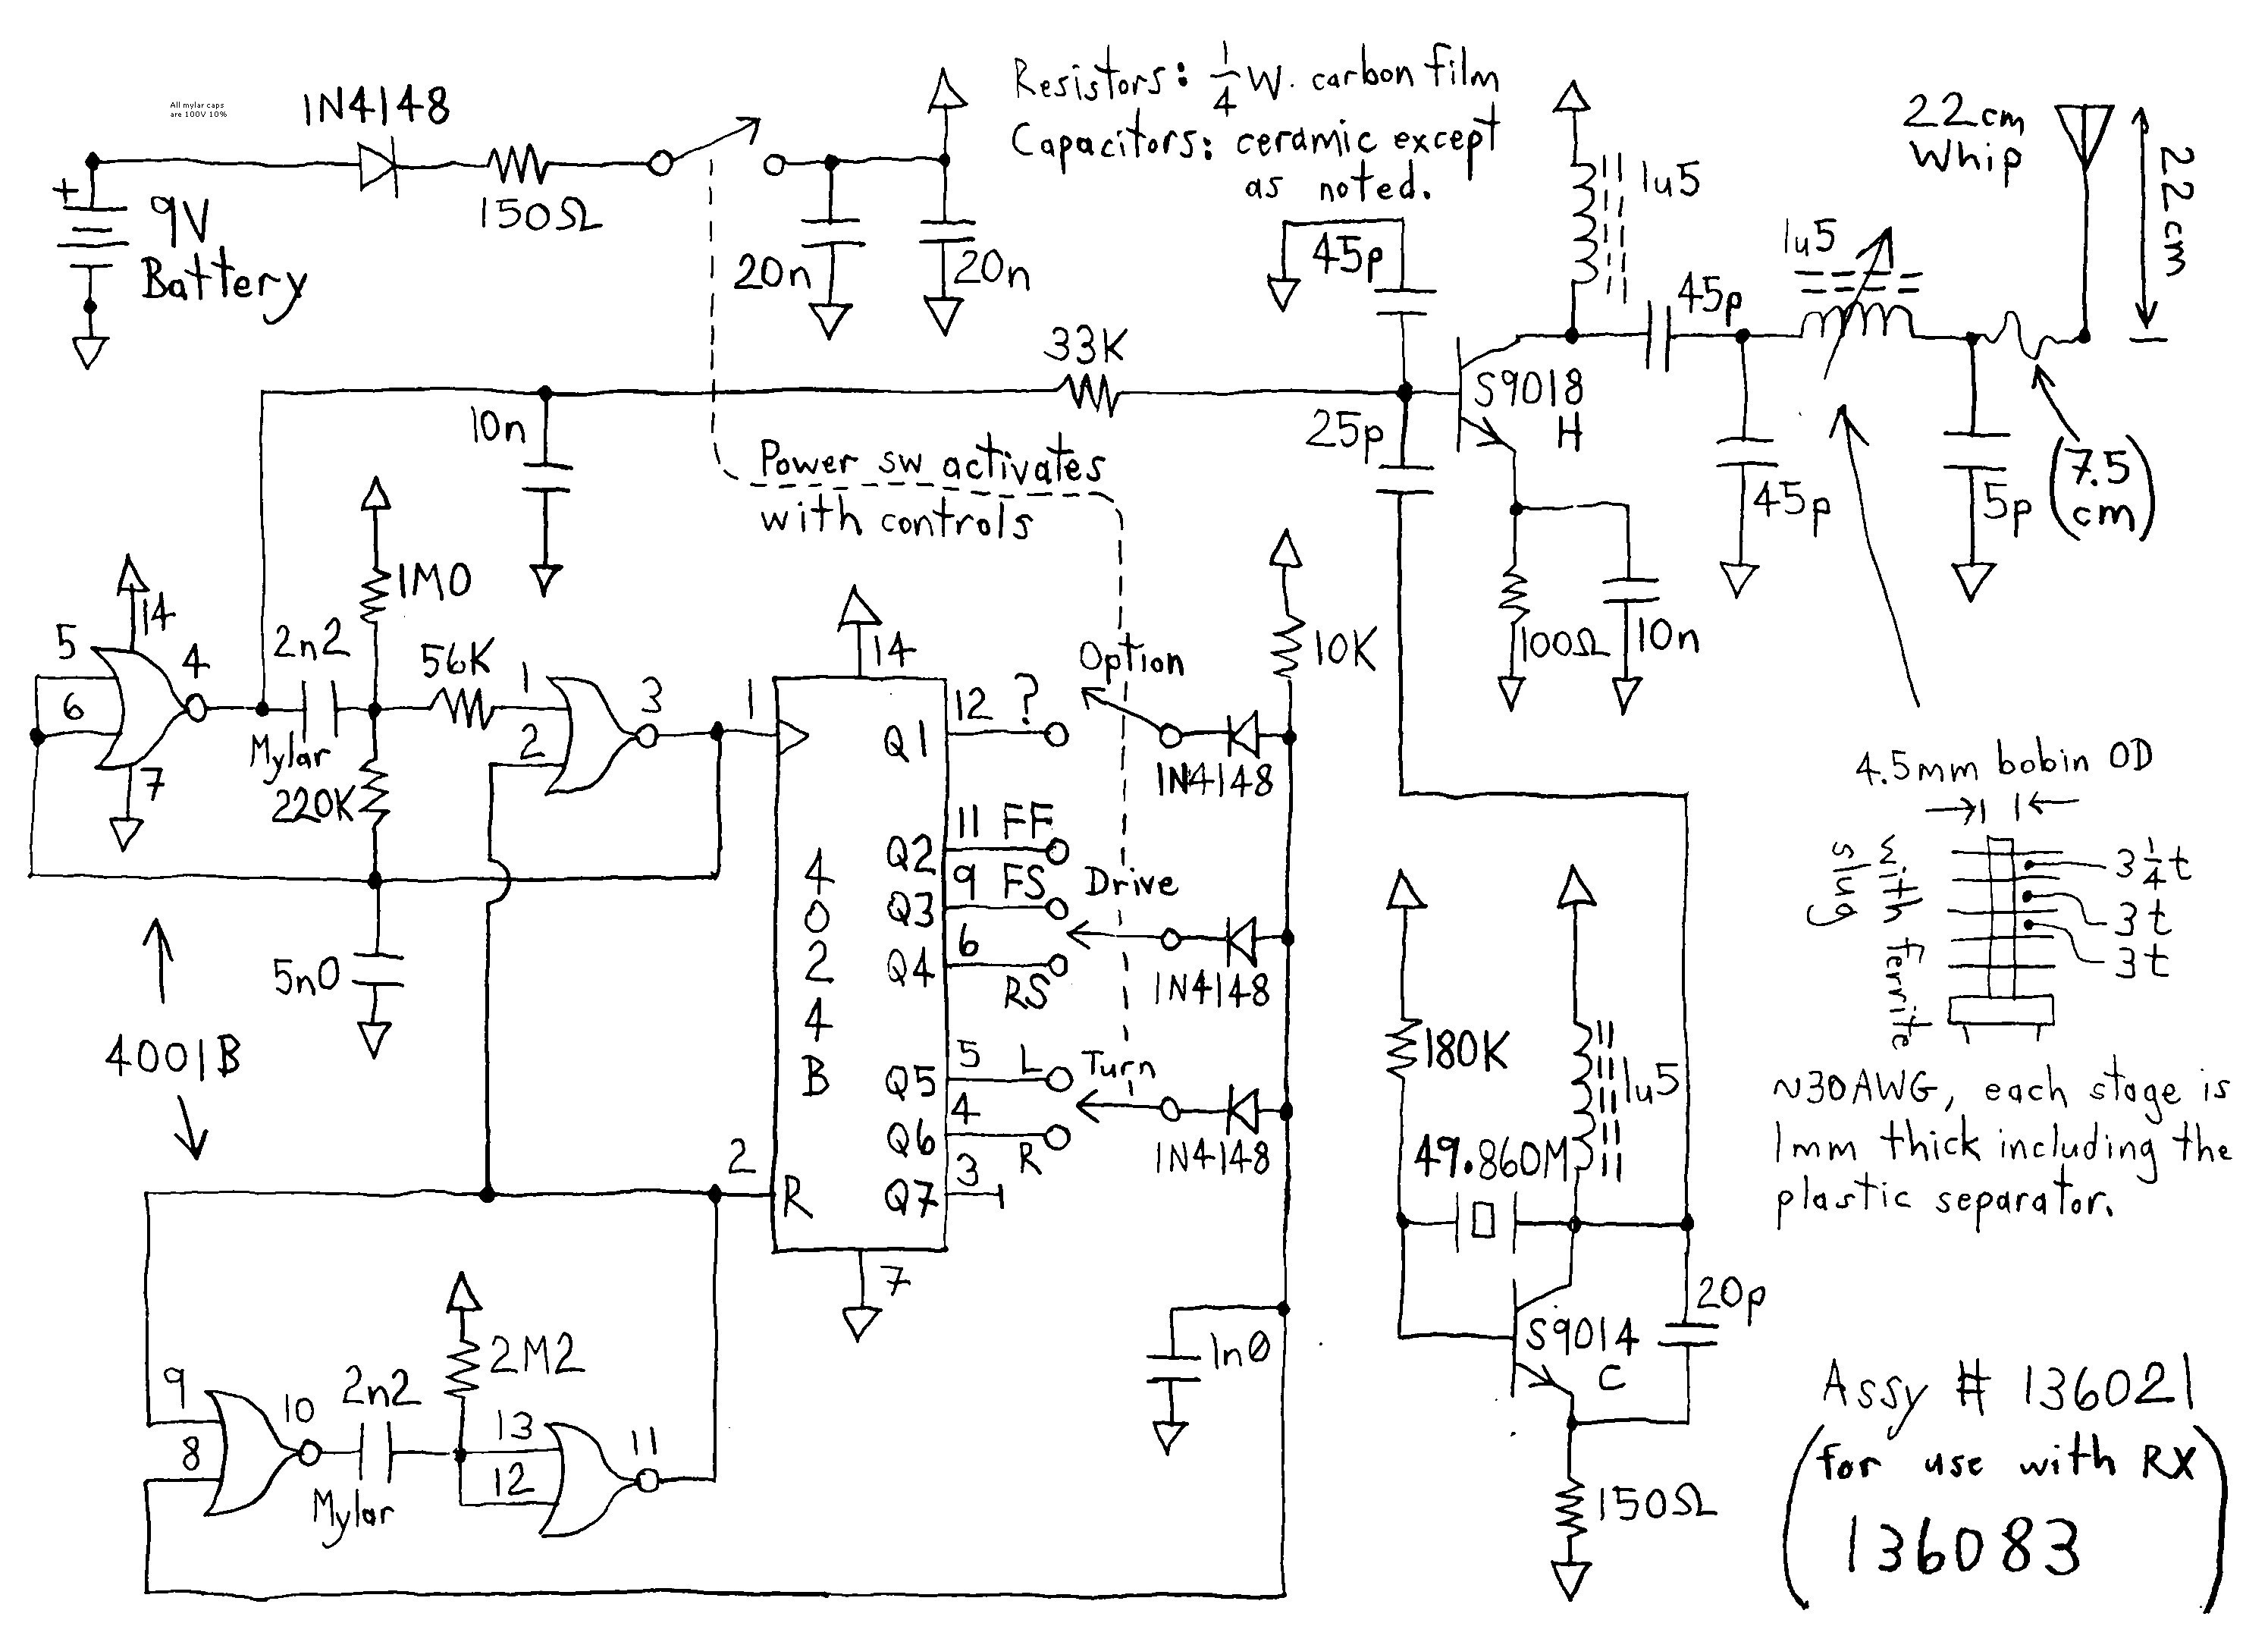 basic wiring diagram symbols Collection-Wiring Diagram Symbols Electrical New Circuit Diagram Symbols 16-g